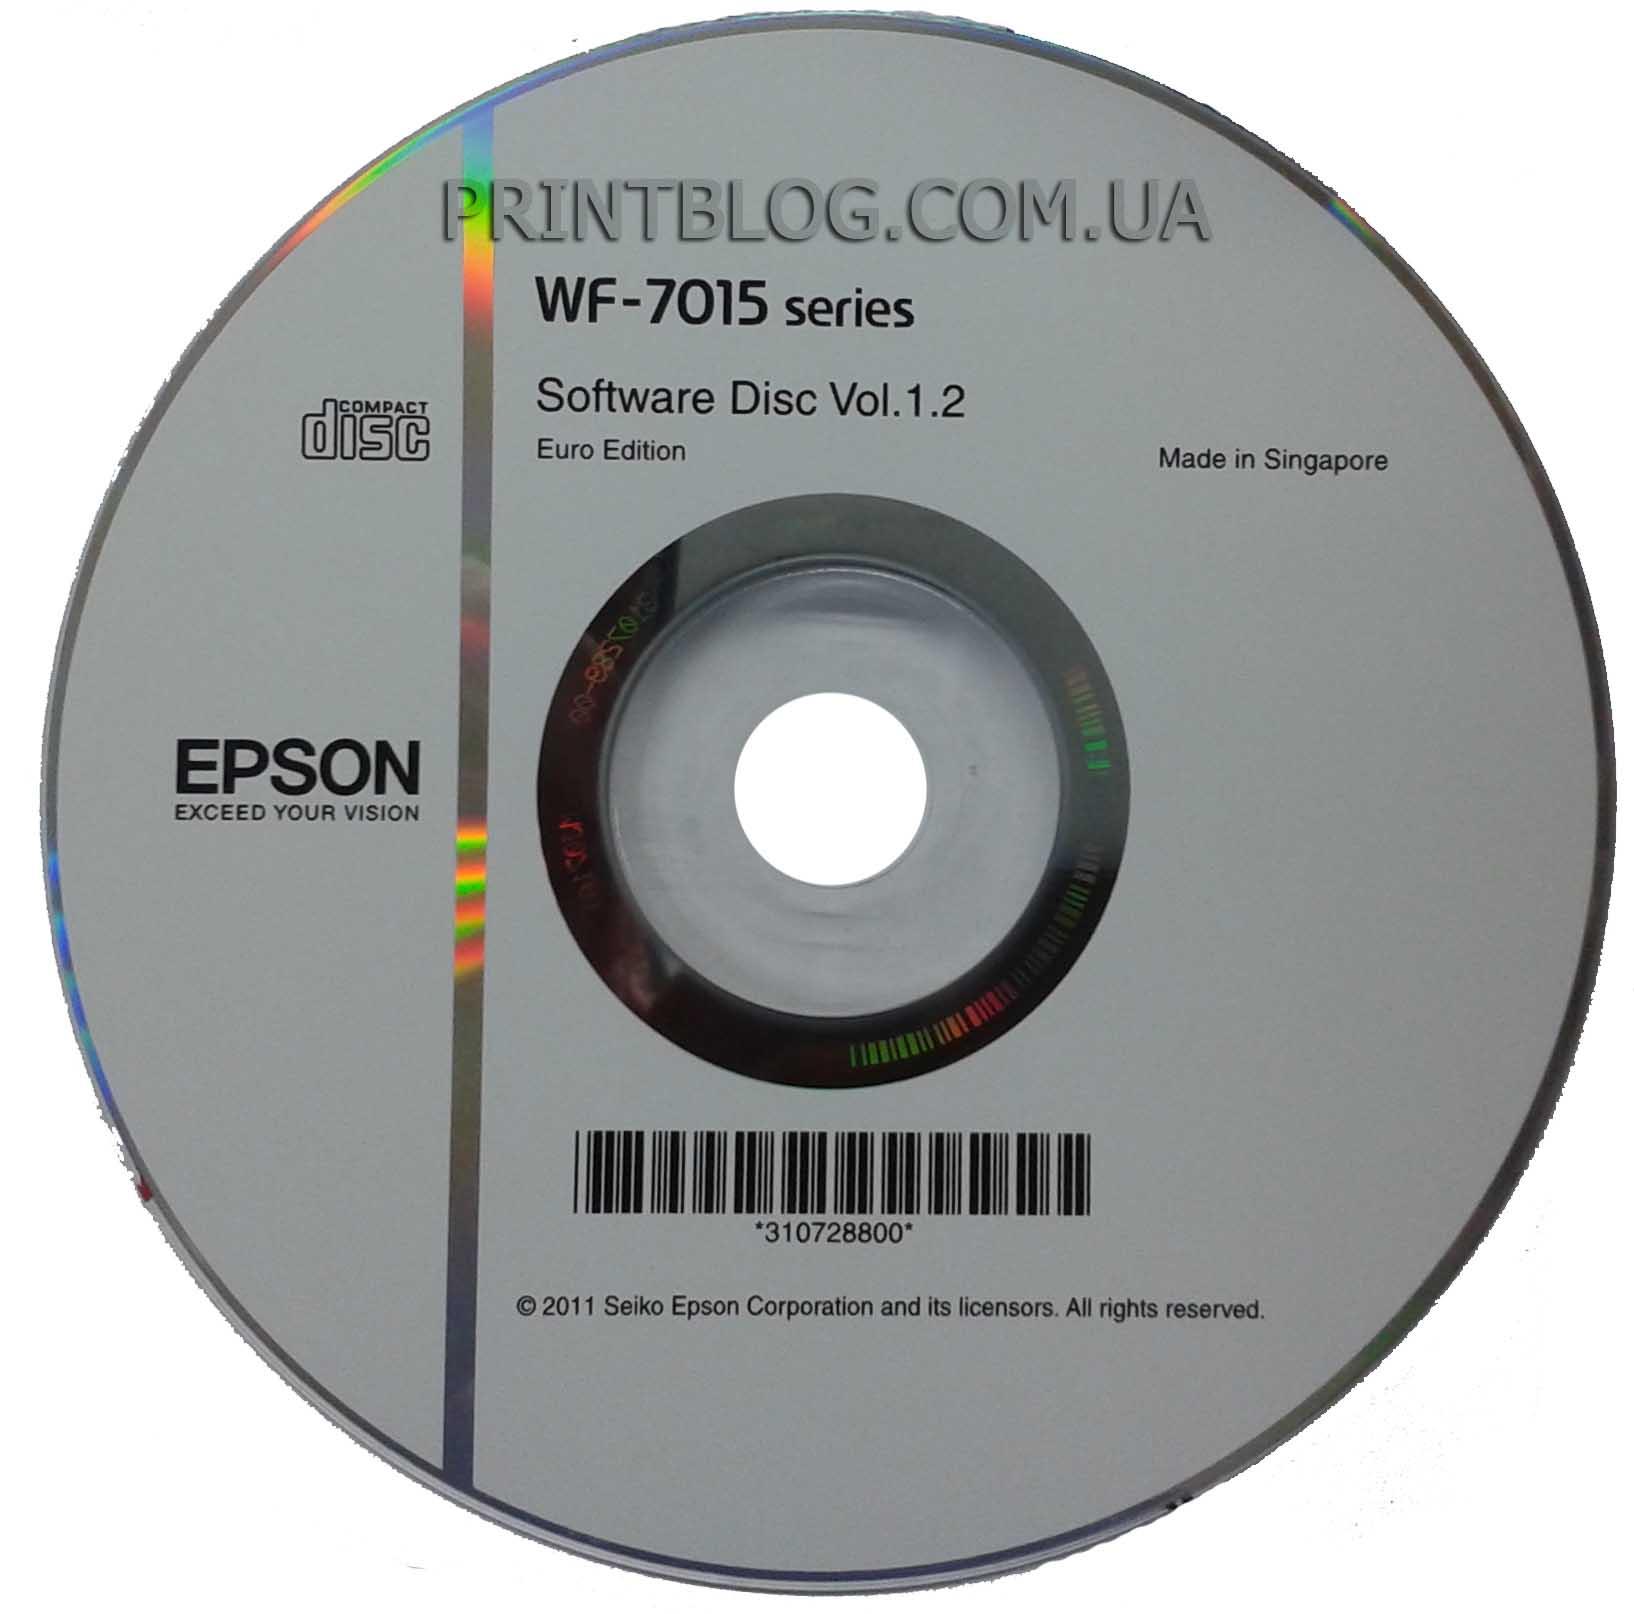 Диск с драйверами Epson WF 7015